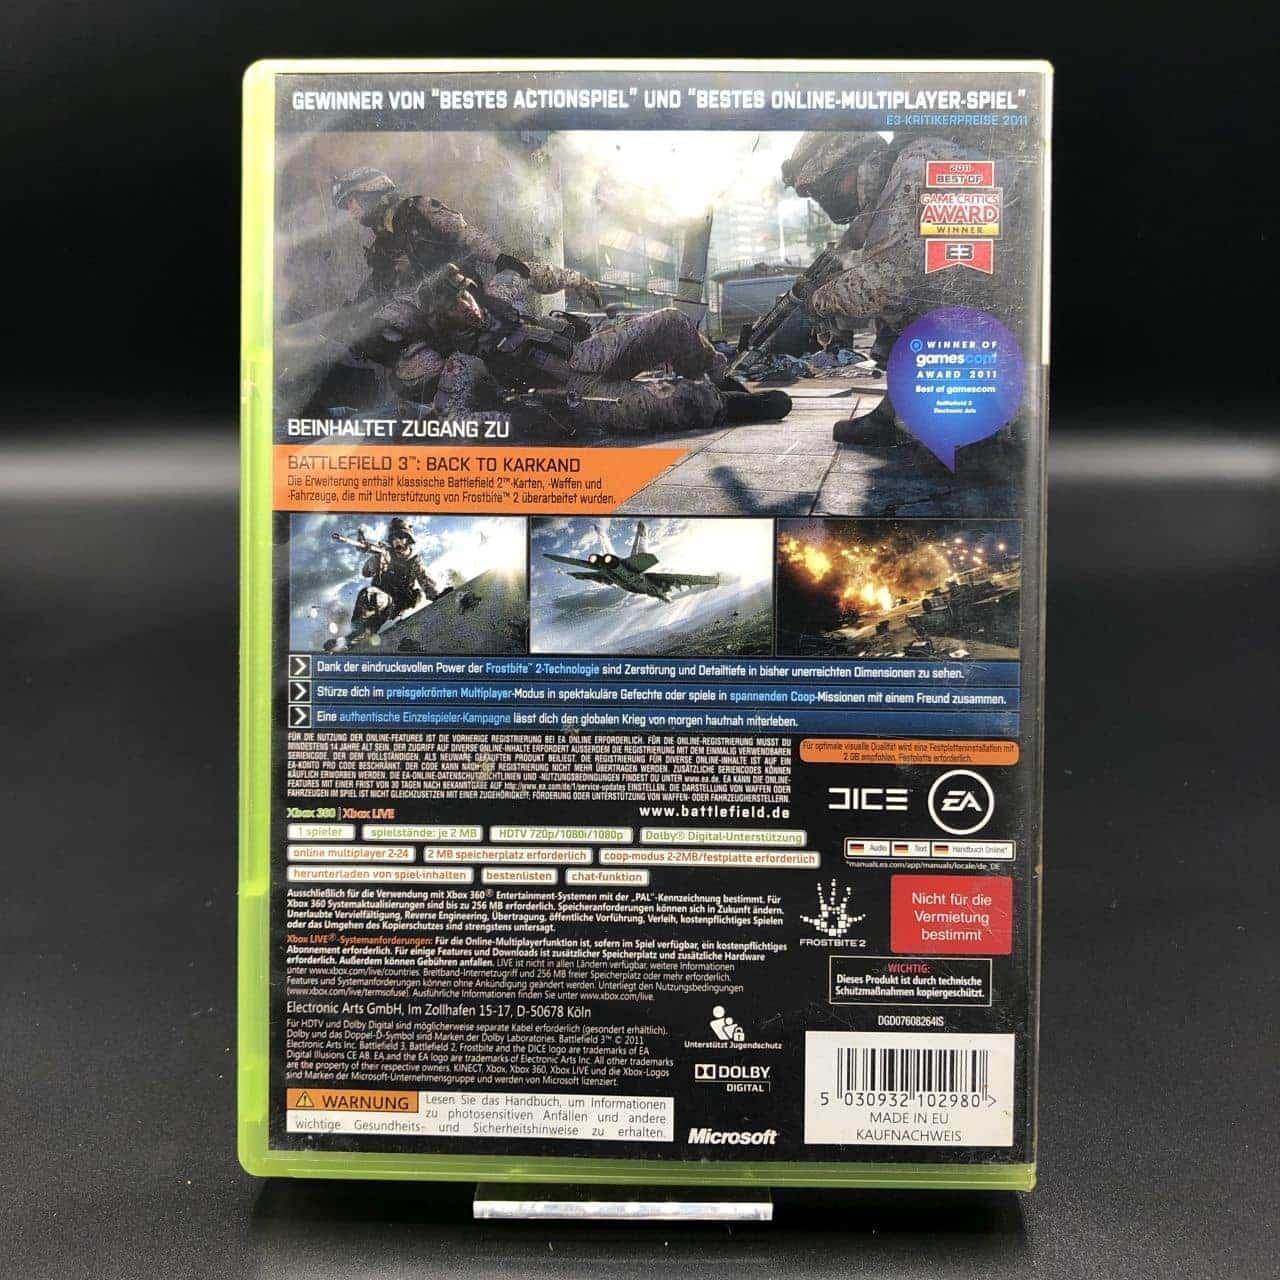 Battlefield 3 (Limited Edition) (ohne Anleitung) (Sehr gut) XBOX 360 (FSK18)